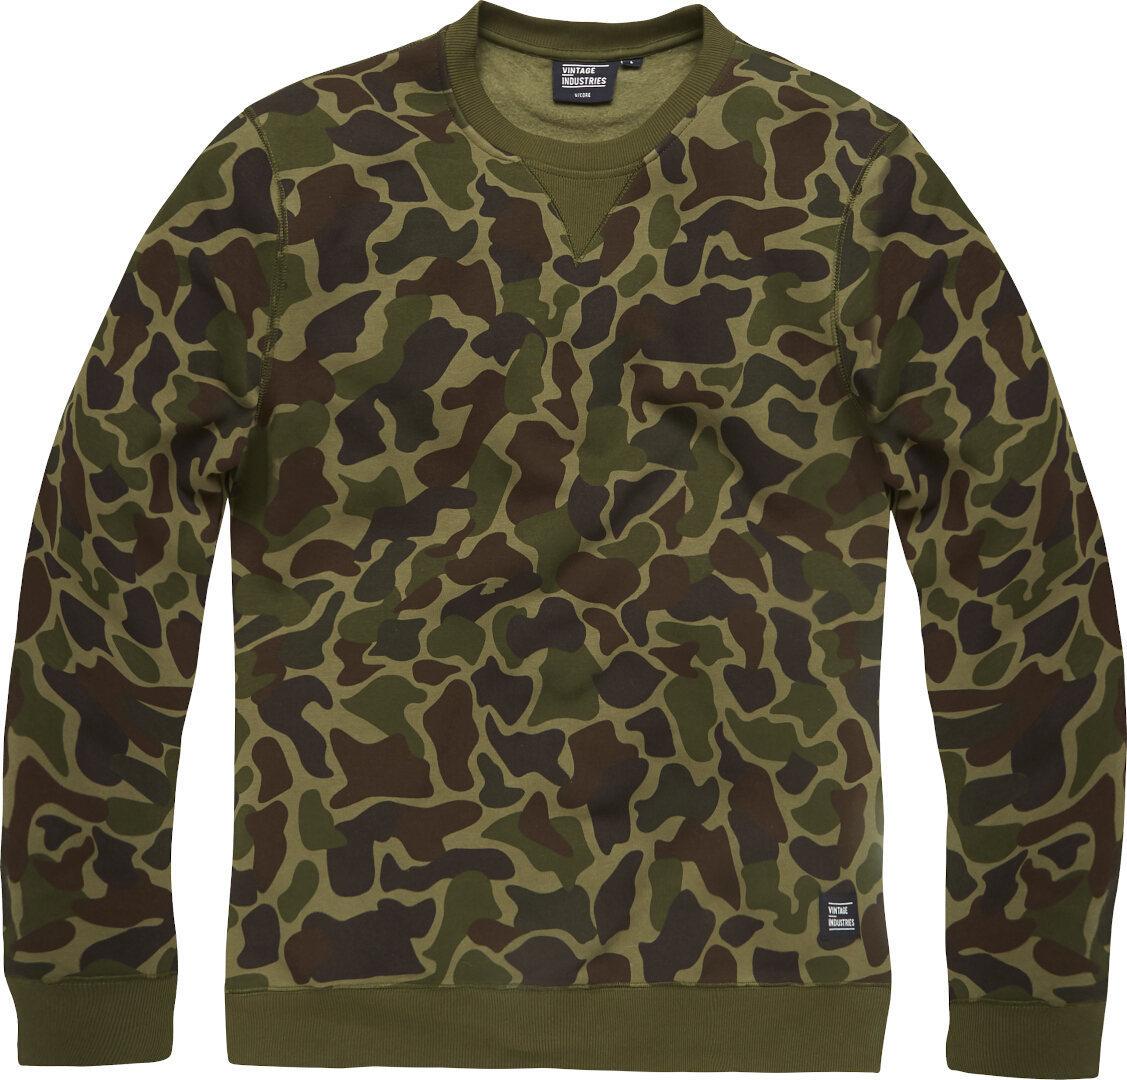 Vintage Industries Camo Greeley Sweatshirt, mehrfarbig, Größe L, mehrfarbig, Größe L